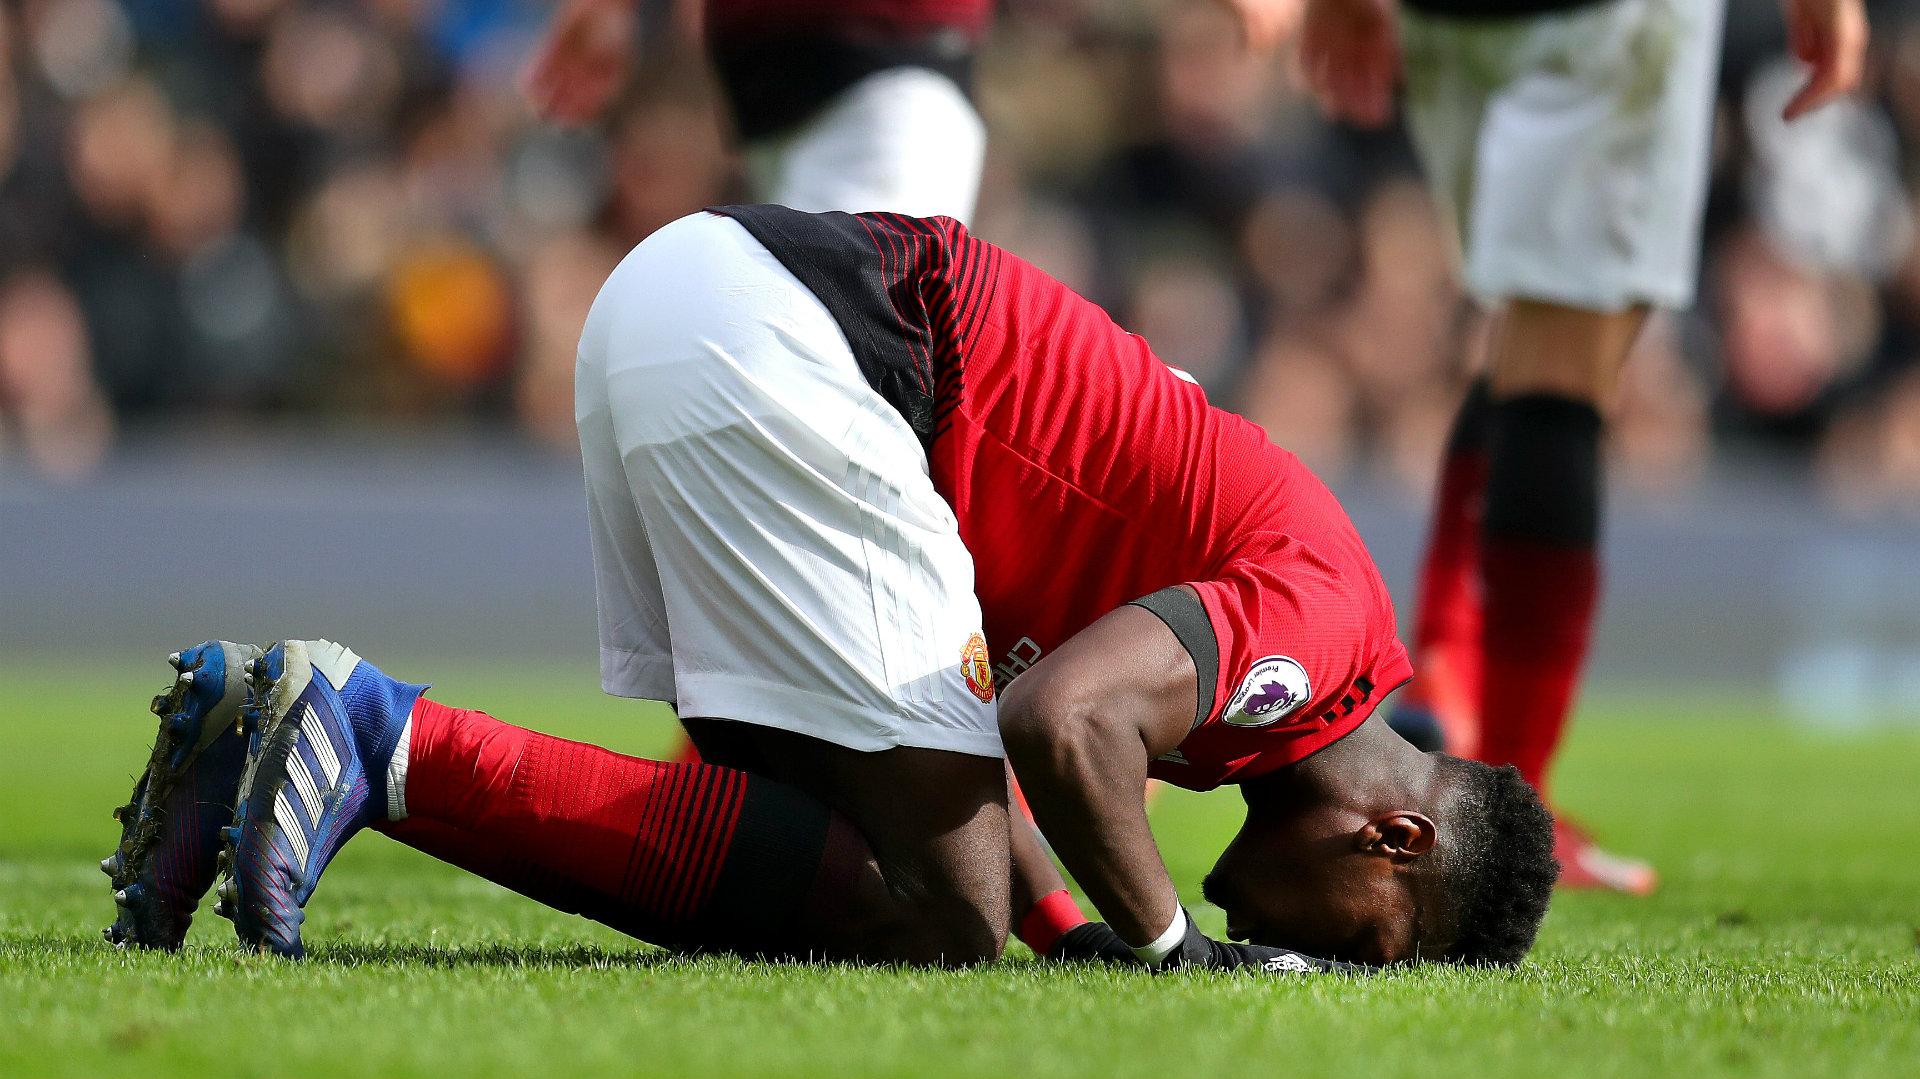 Man U Vs Fulham: Paul Pogba News: Man Utd Midfielder Enjoying Best Ever